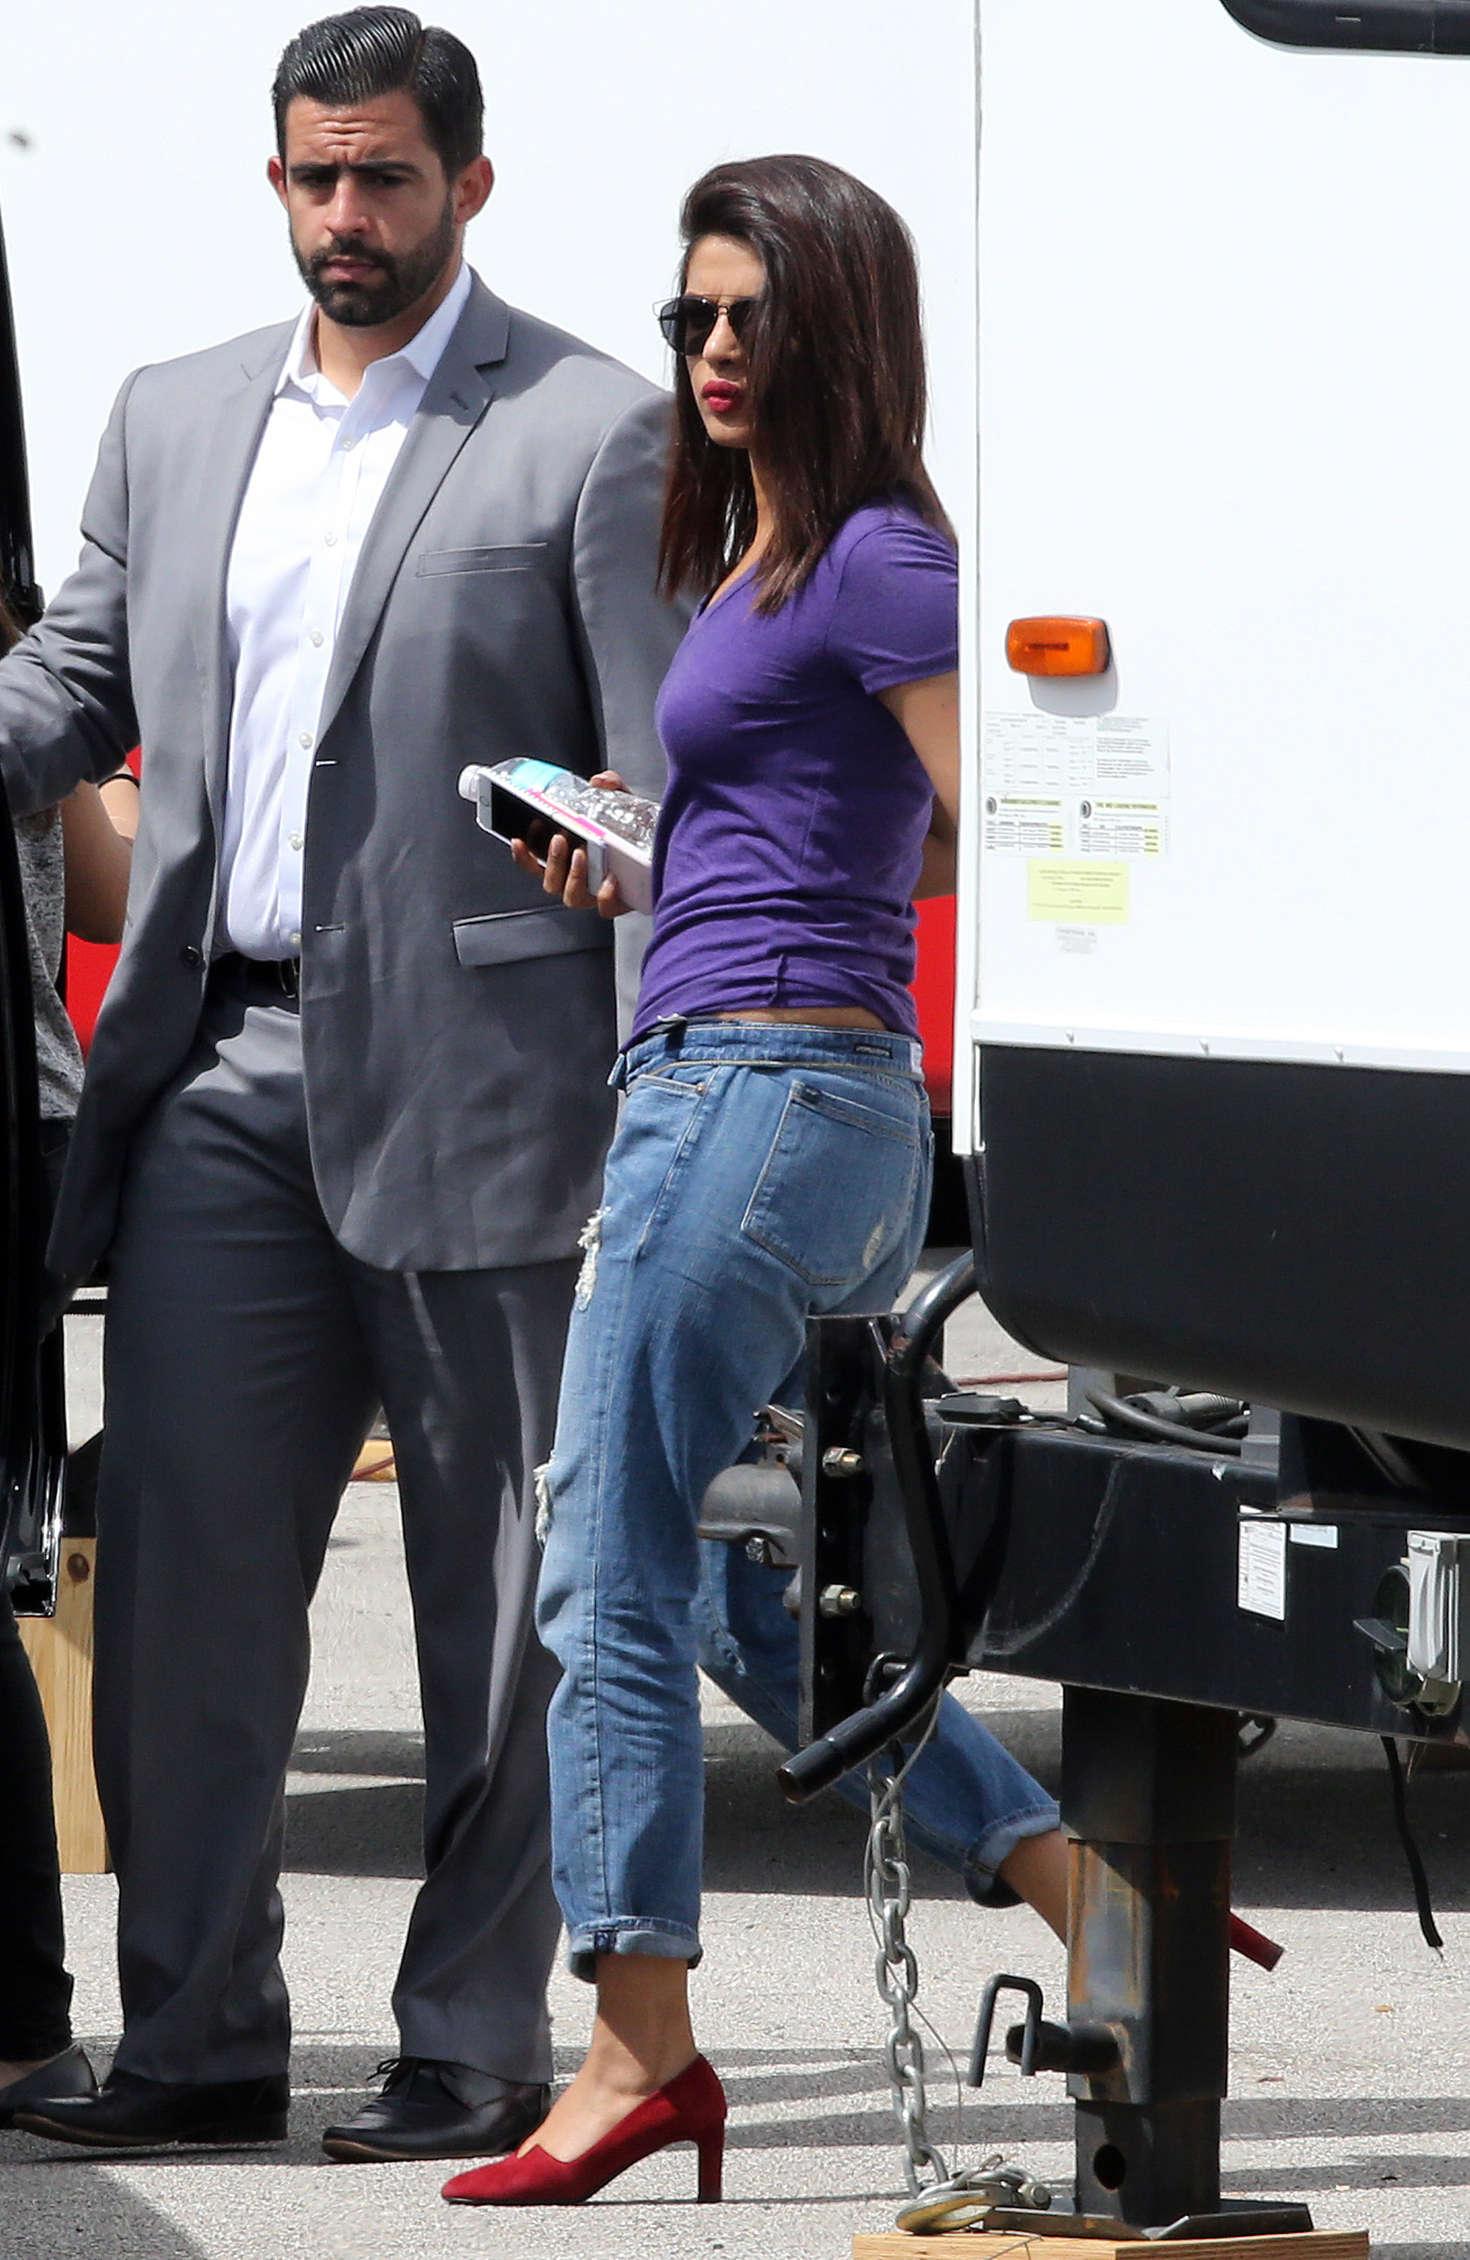 Priyanka Chopra on Set to Film 'Baywatch' in Miami